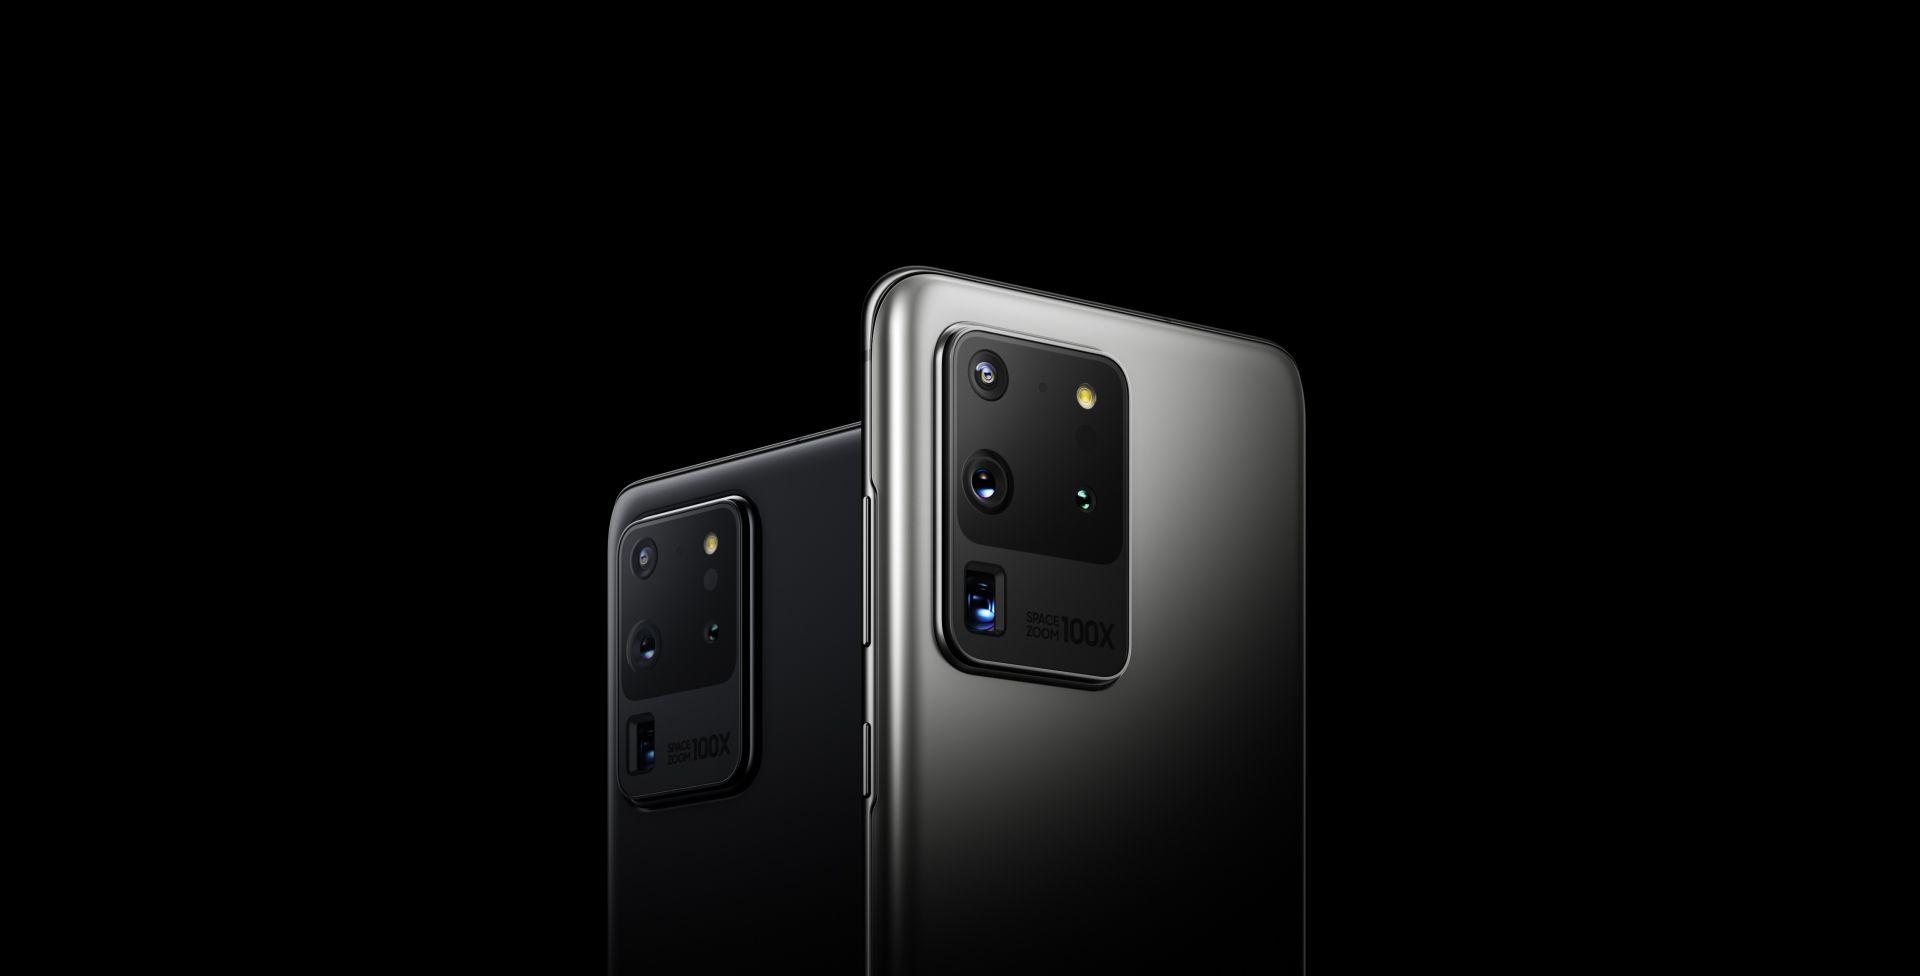 Samsung Galaxy Note 20 Ultra มีข่าวลือว่าจะเปิดตัวในเดือนสิงหาคม